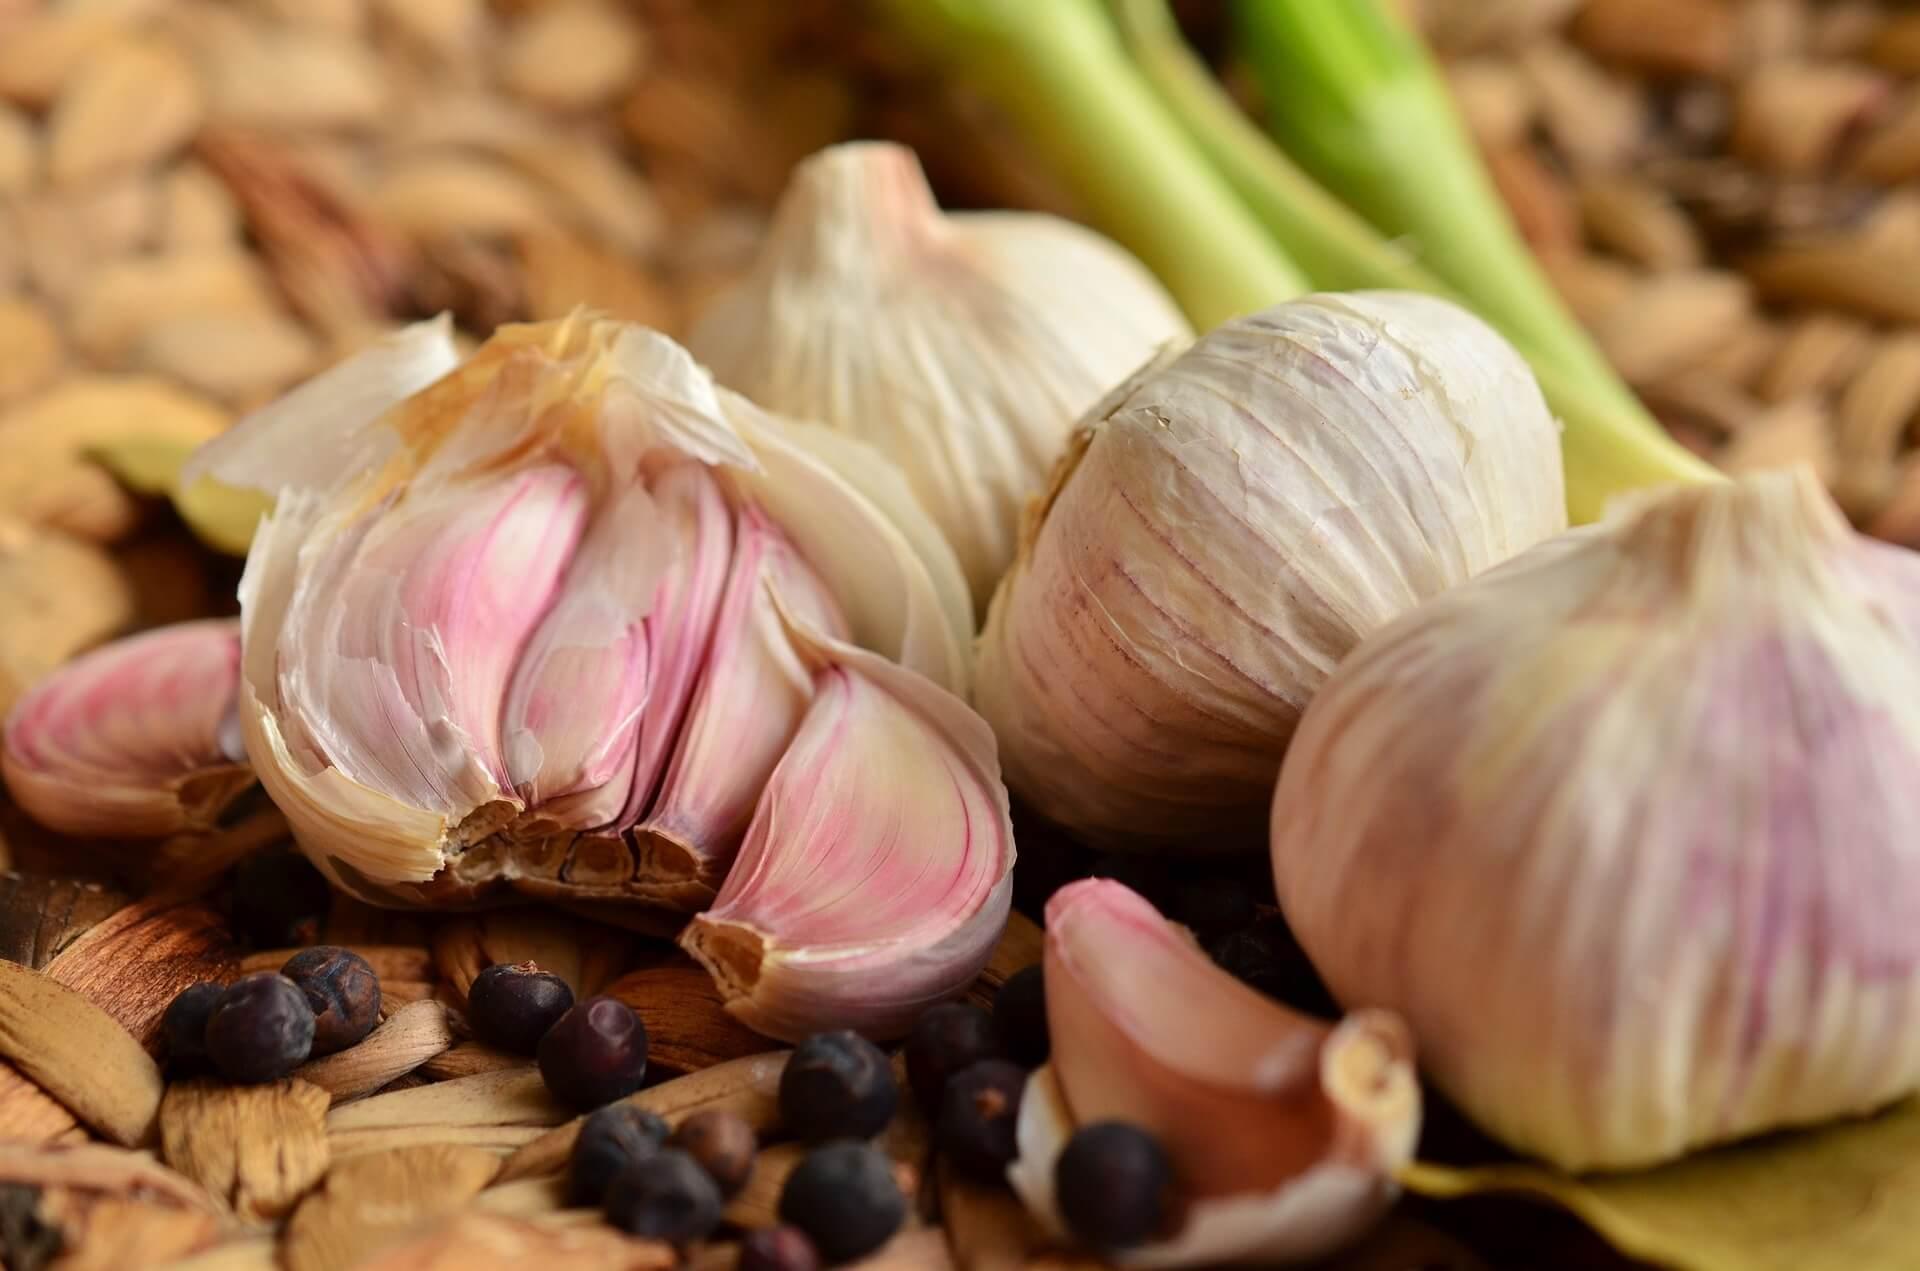 Knoblauch Low Carb Gemüsesorten